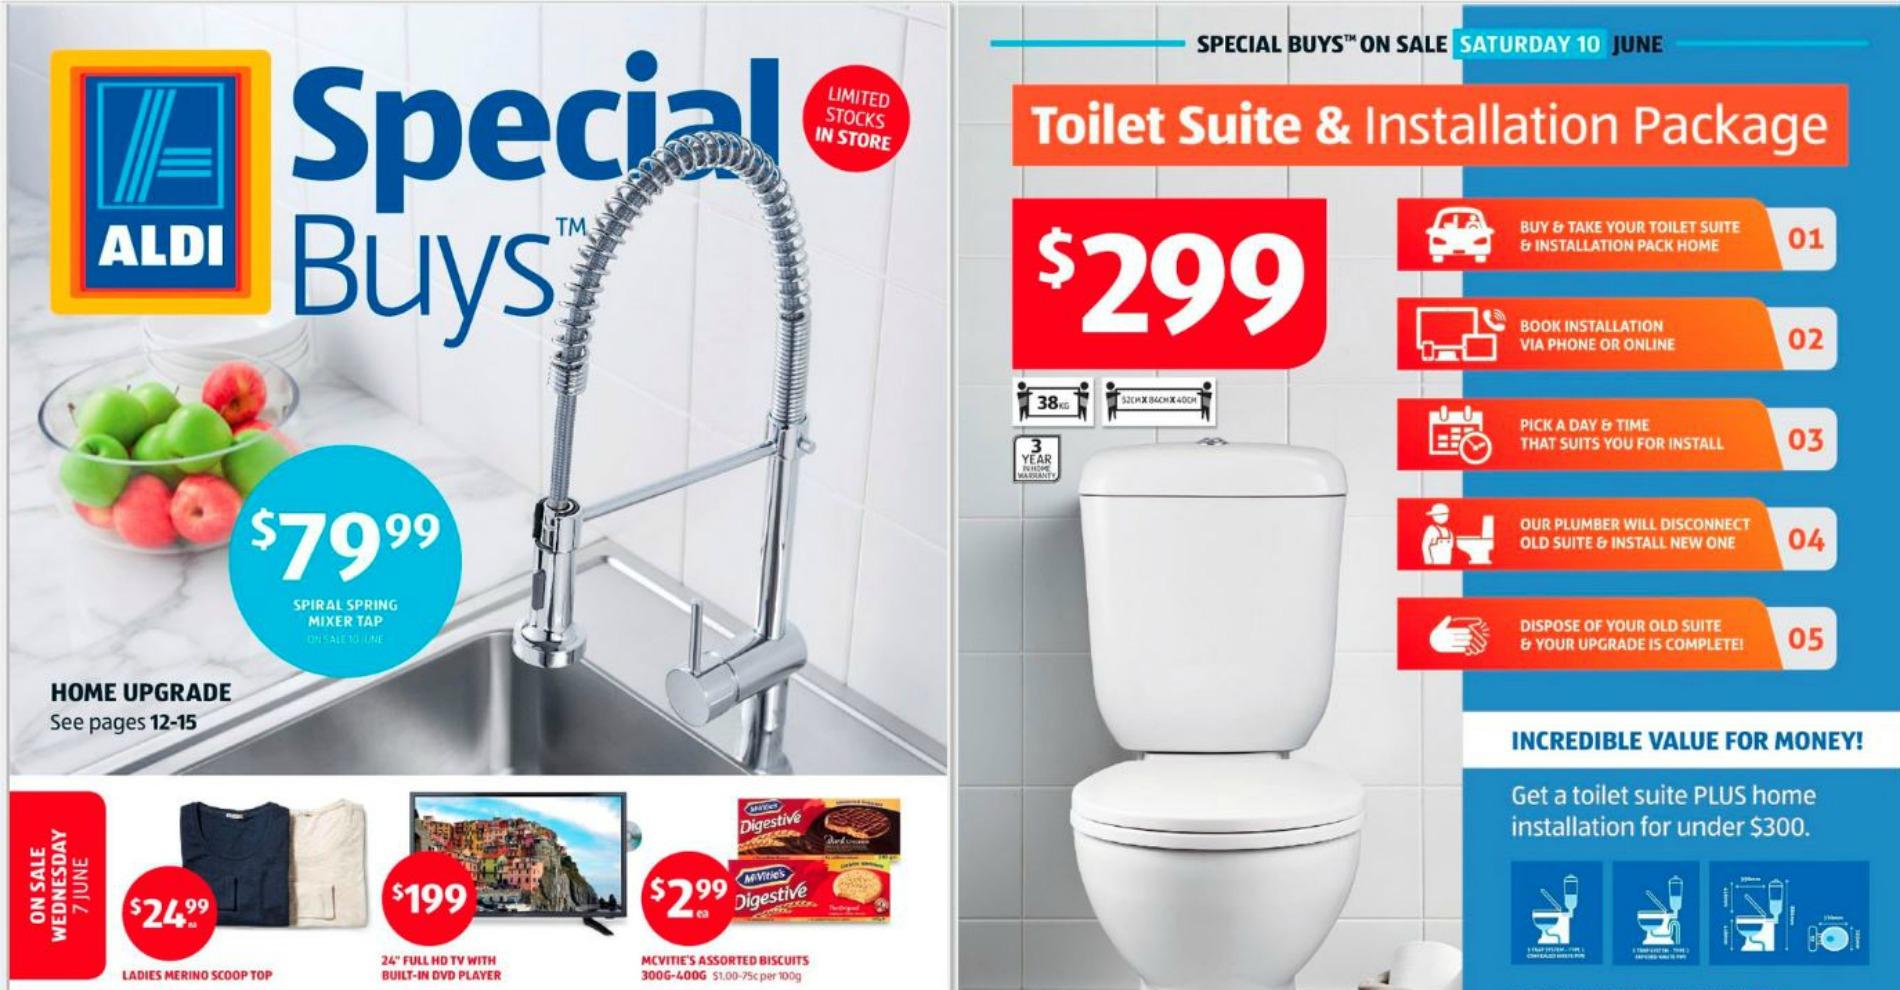 ALDI plumbing products avoid buying